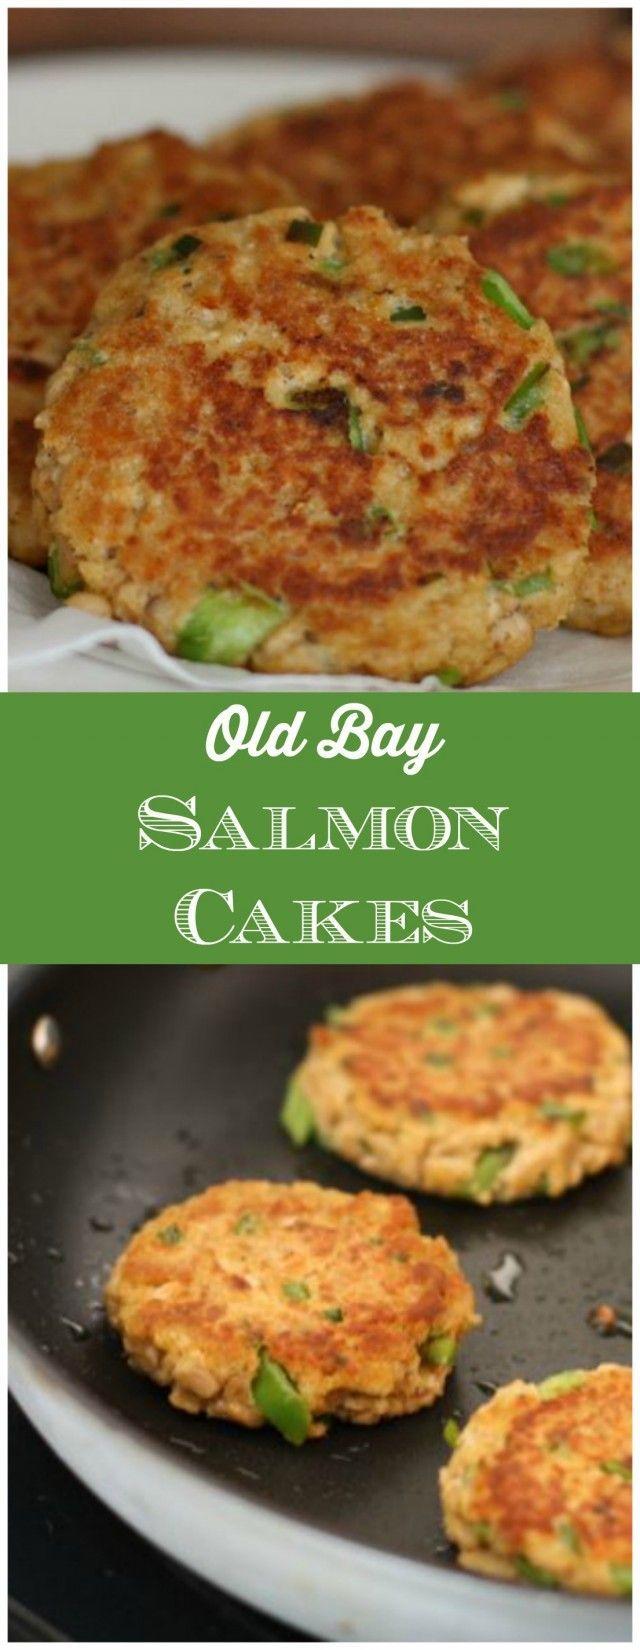 Old Bay Salmon Cakes Recipe Easy Family Dinner Recipes